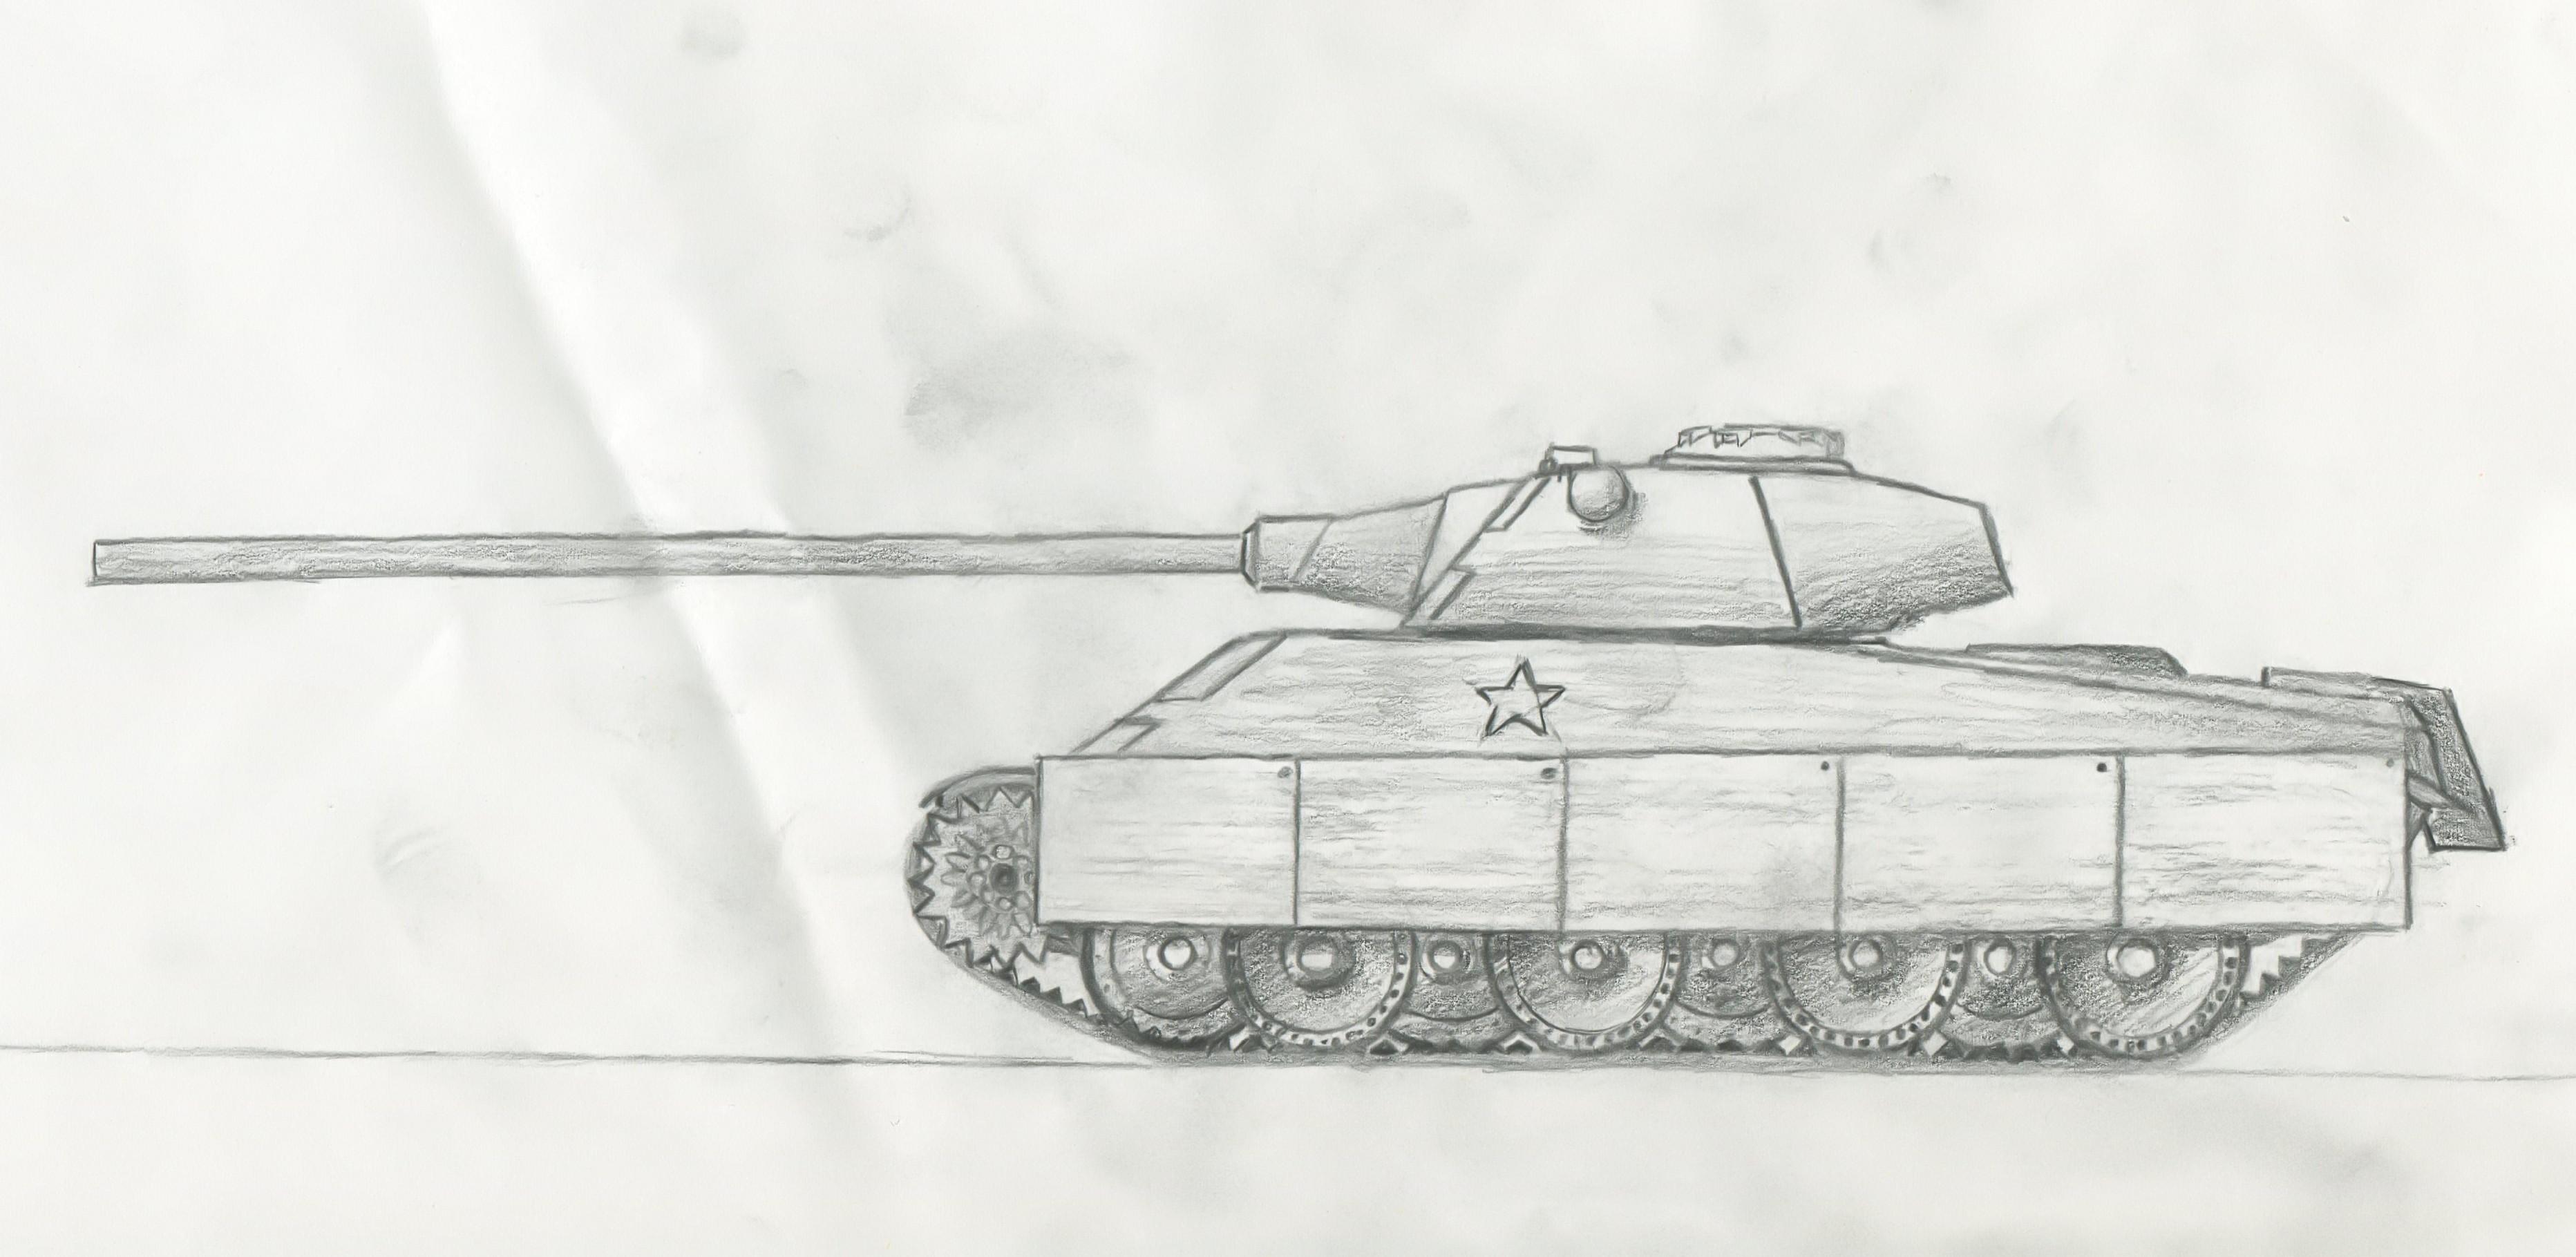 how to draw army tanks free